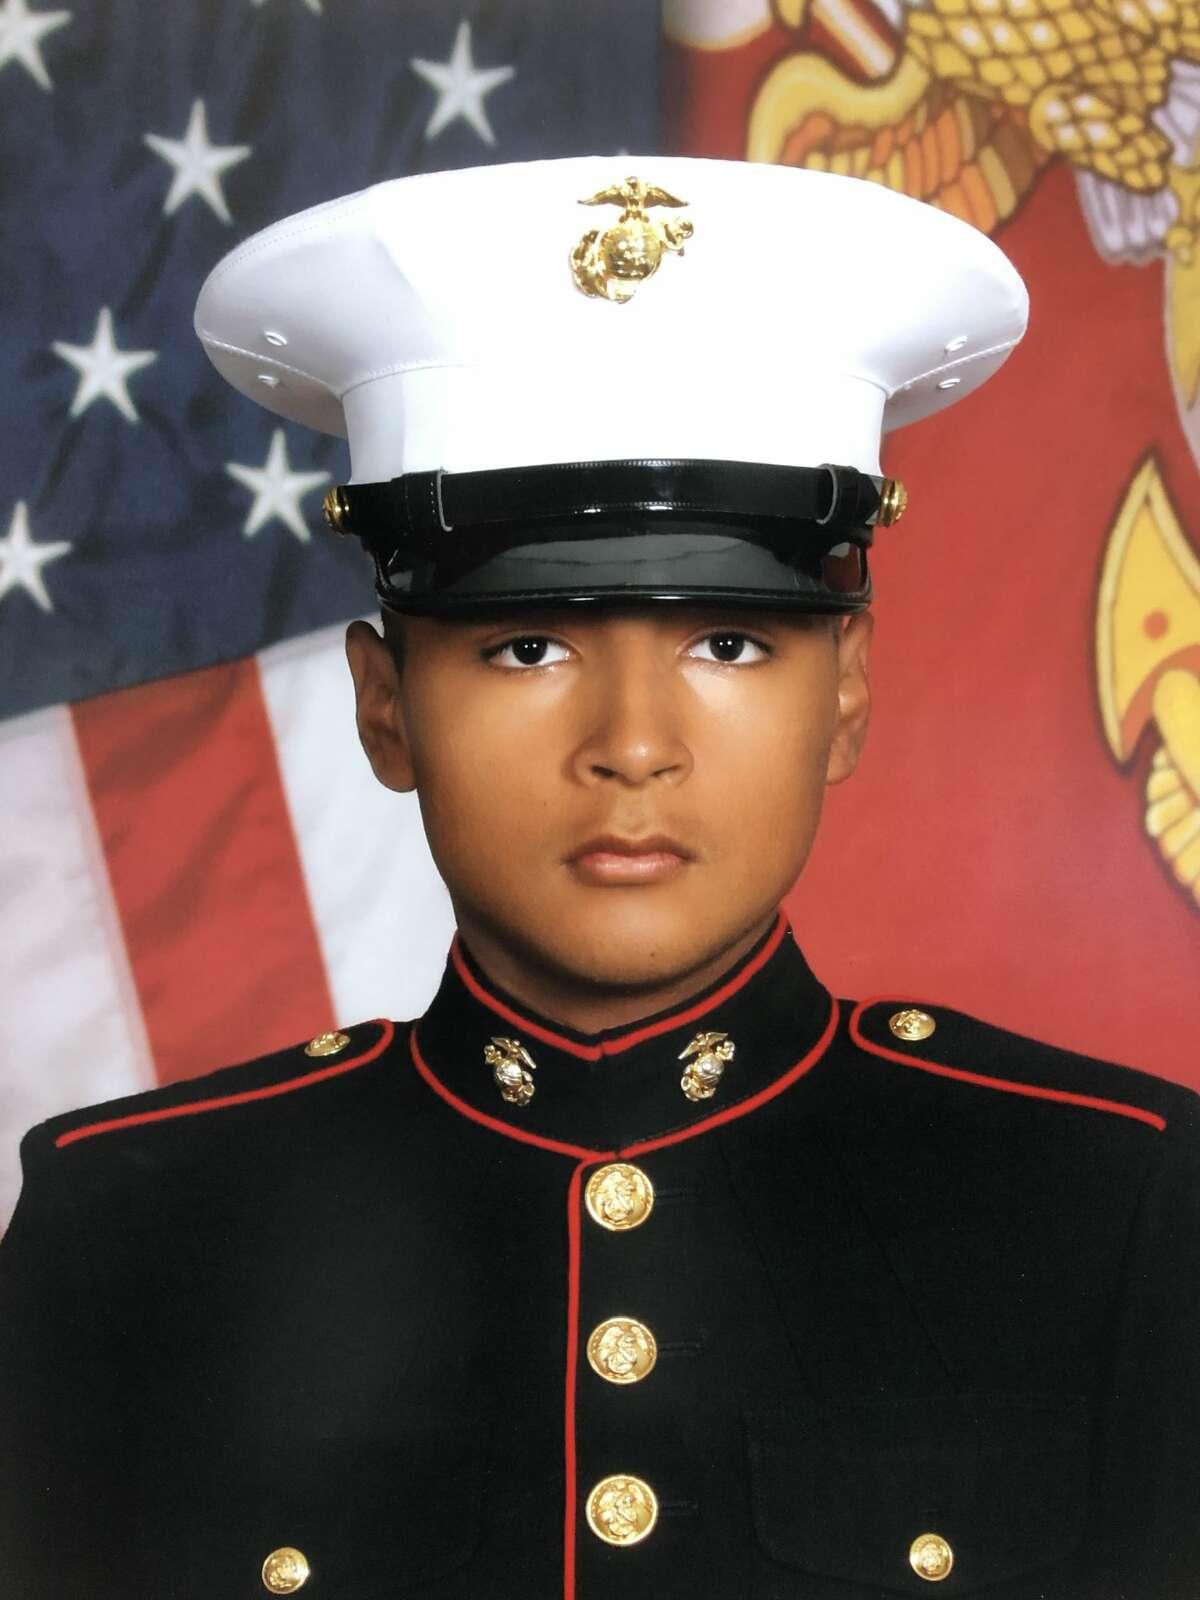 Lance Corporal David Lee Espinoza